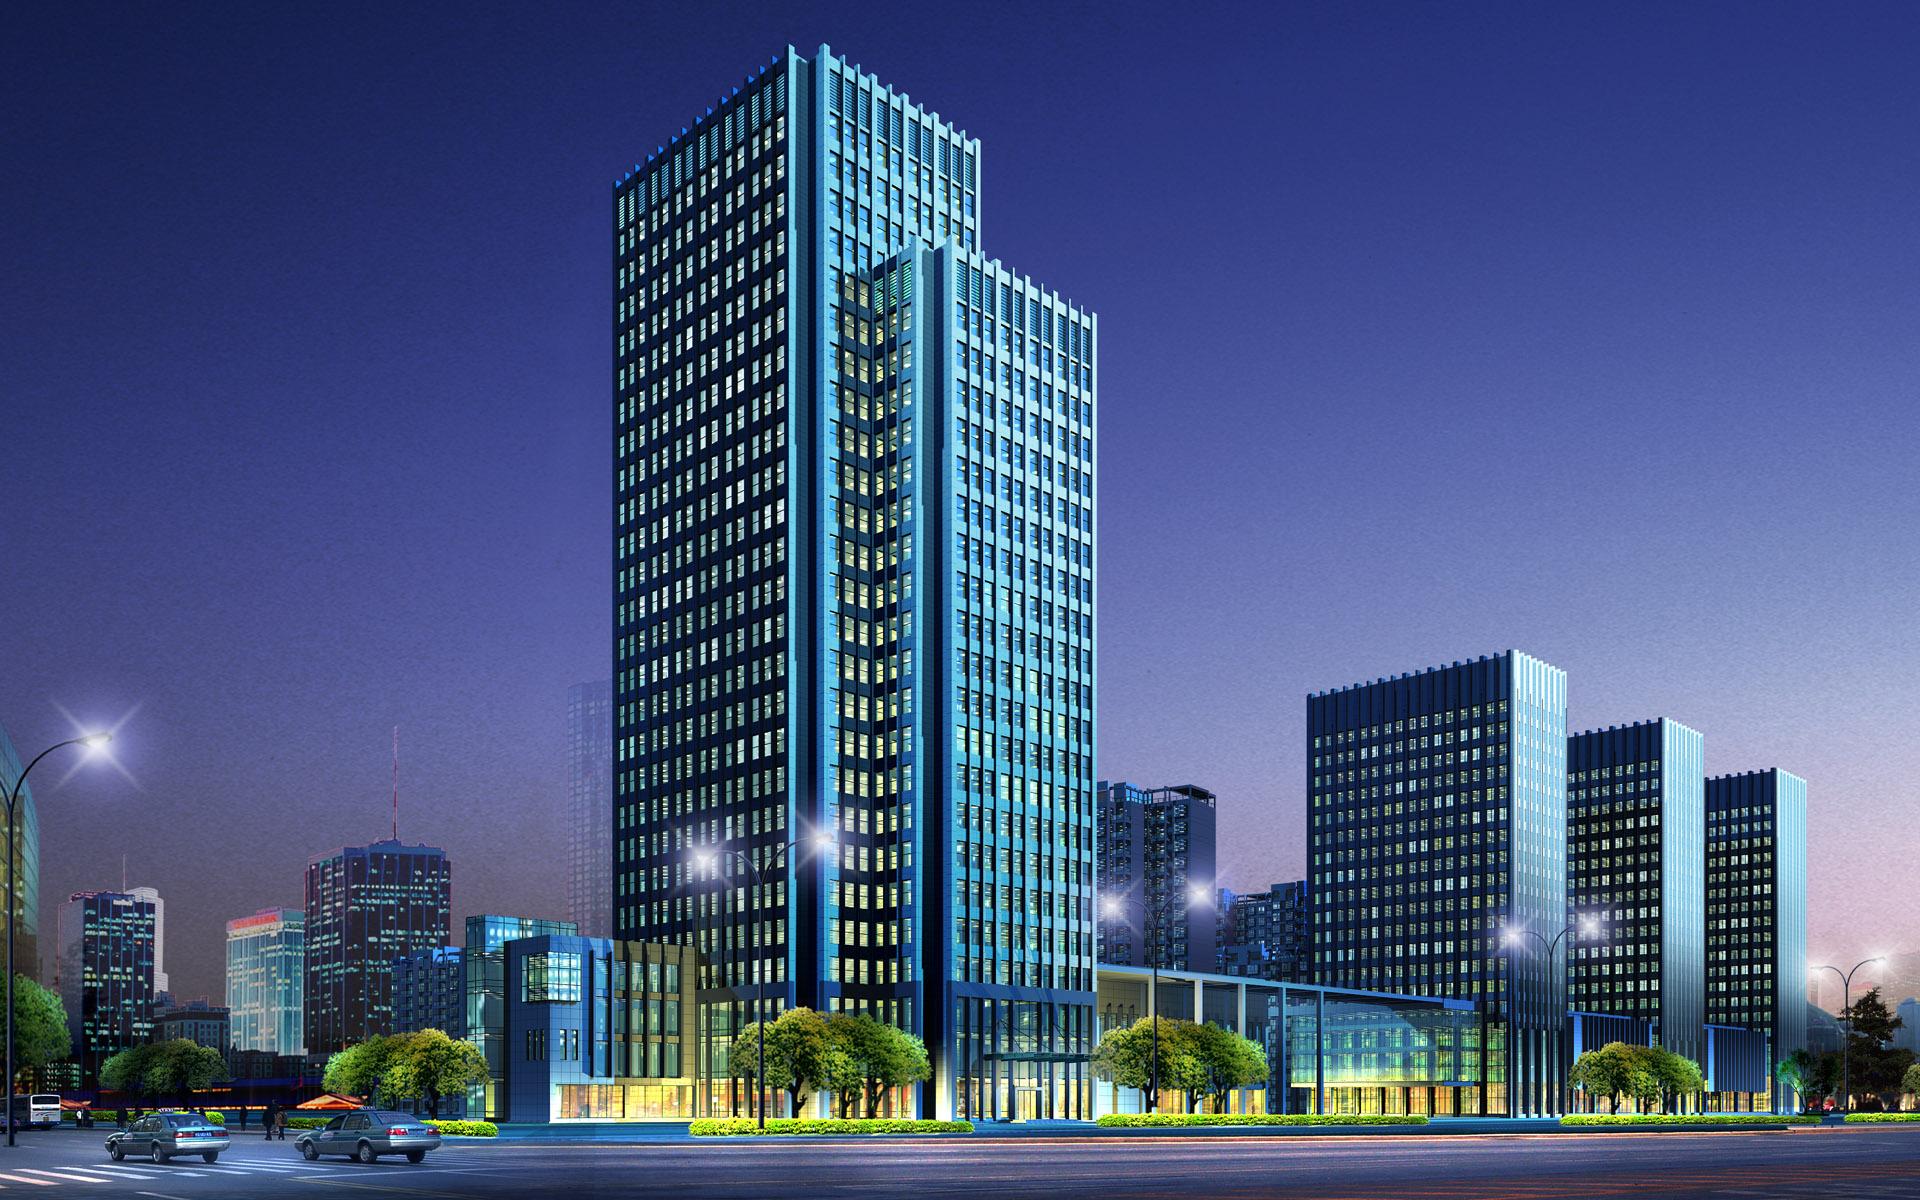 Commercial Building 3D Architectural Renderings CSJZXG 1012 Kiểm toán năng lượng